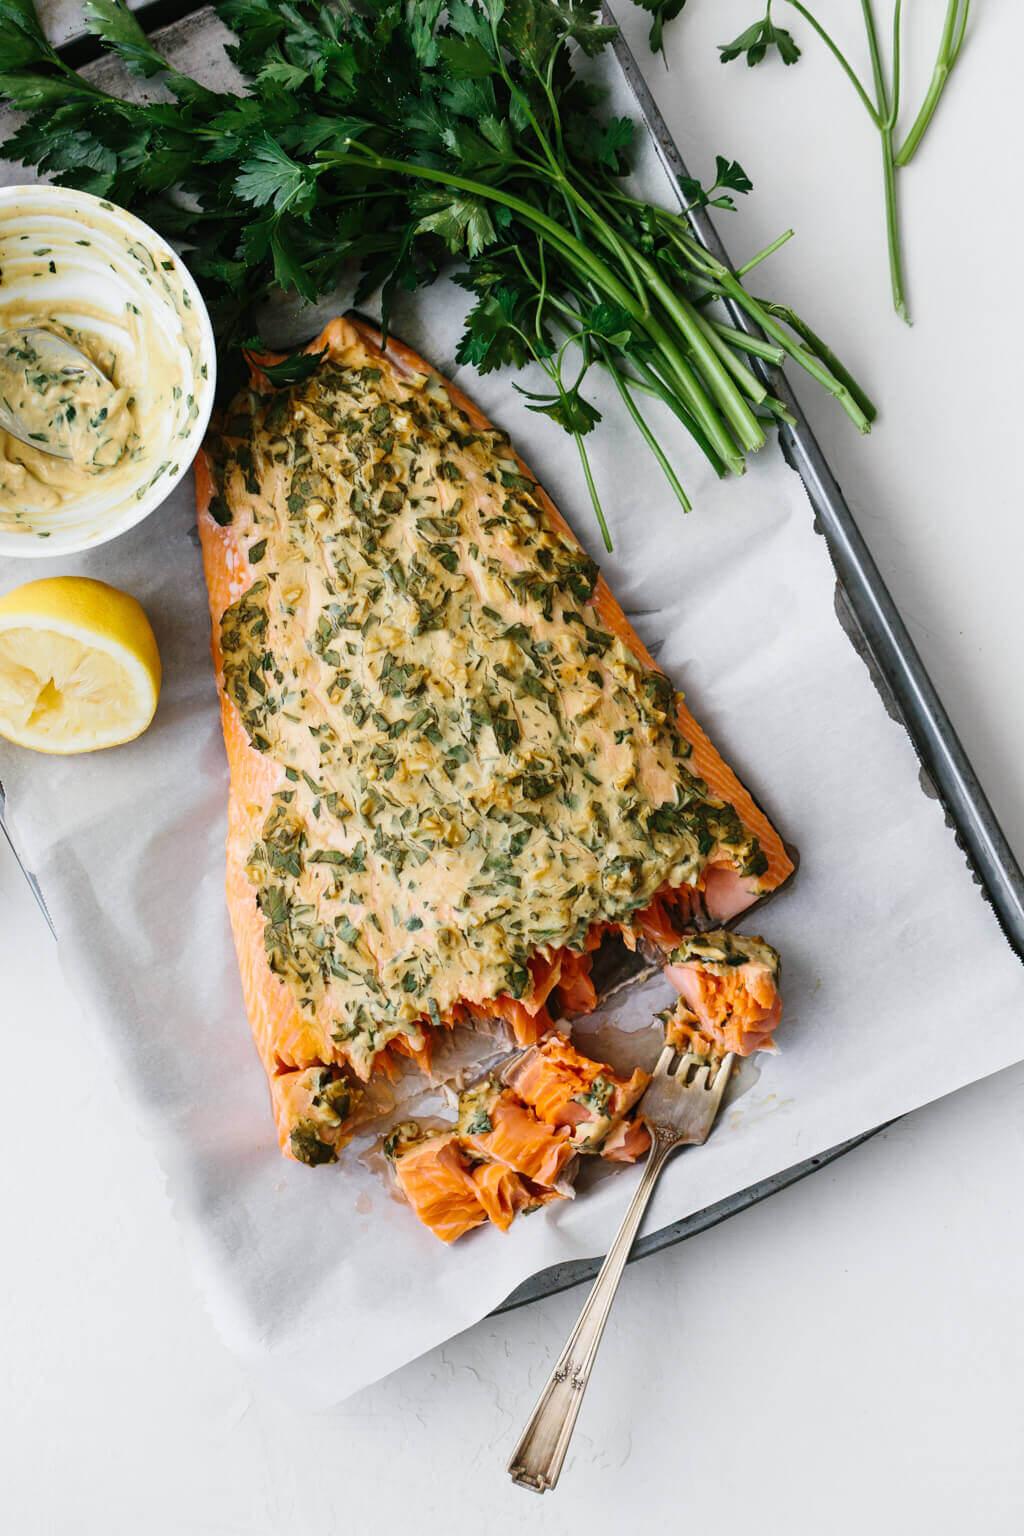 19.Dijon Baked Salmon